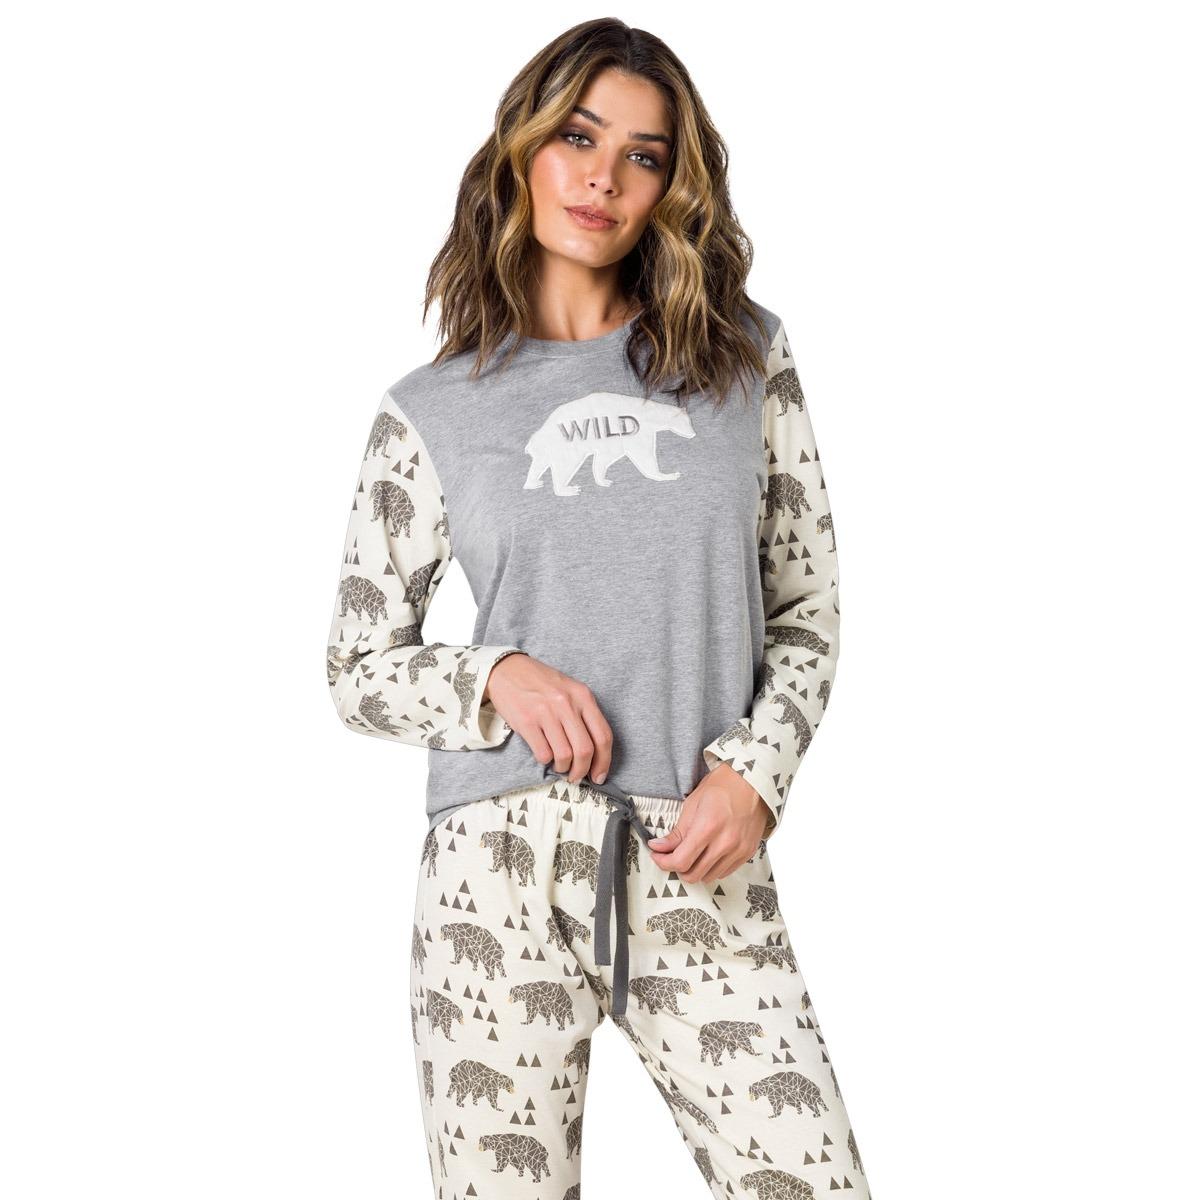 0e5661ffde Pijama Longo Adulto - Louvre - R  147